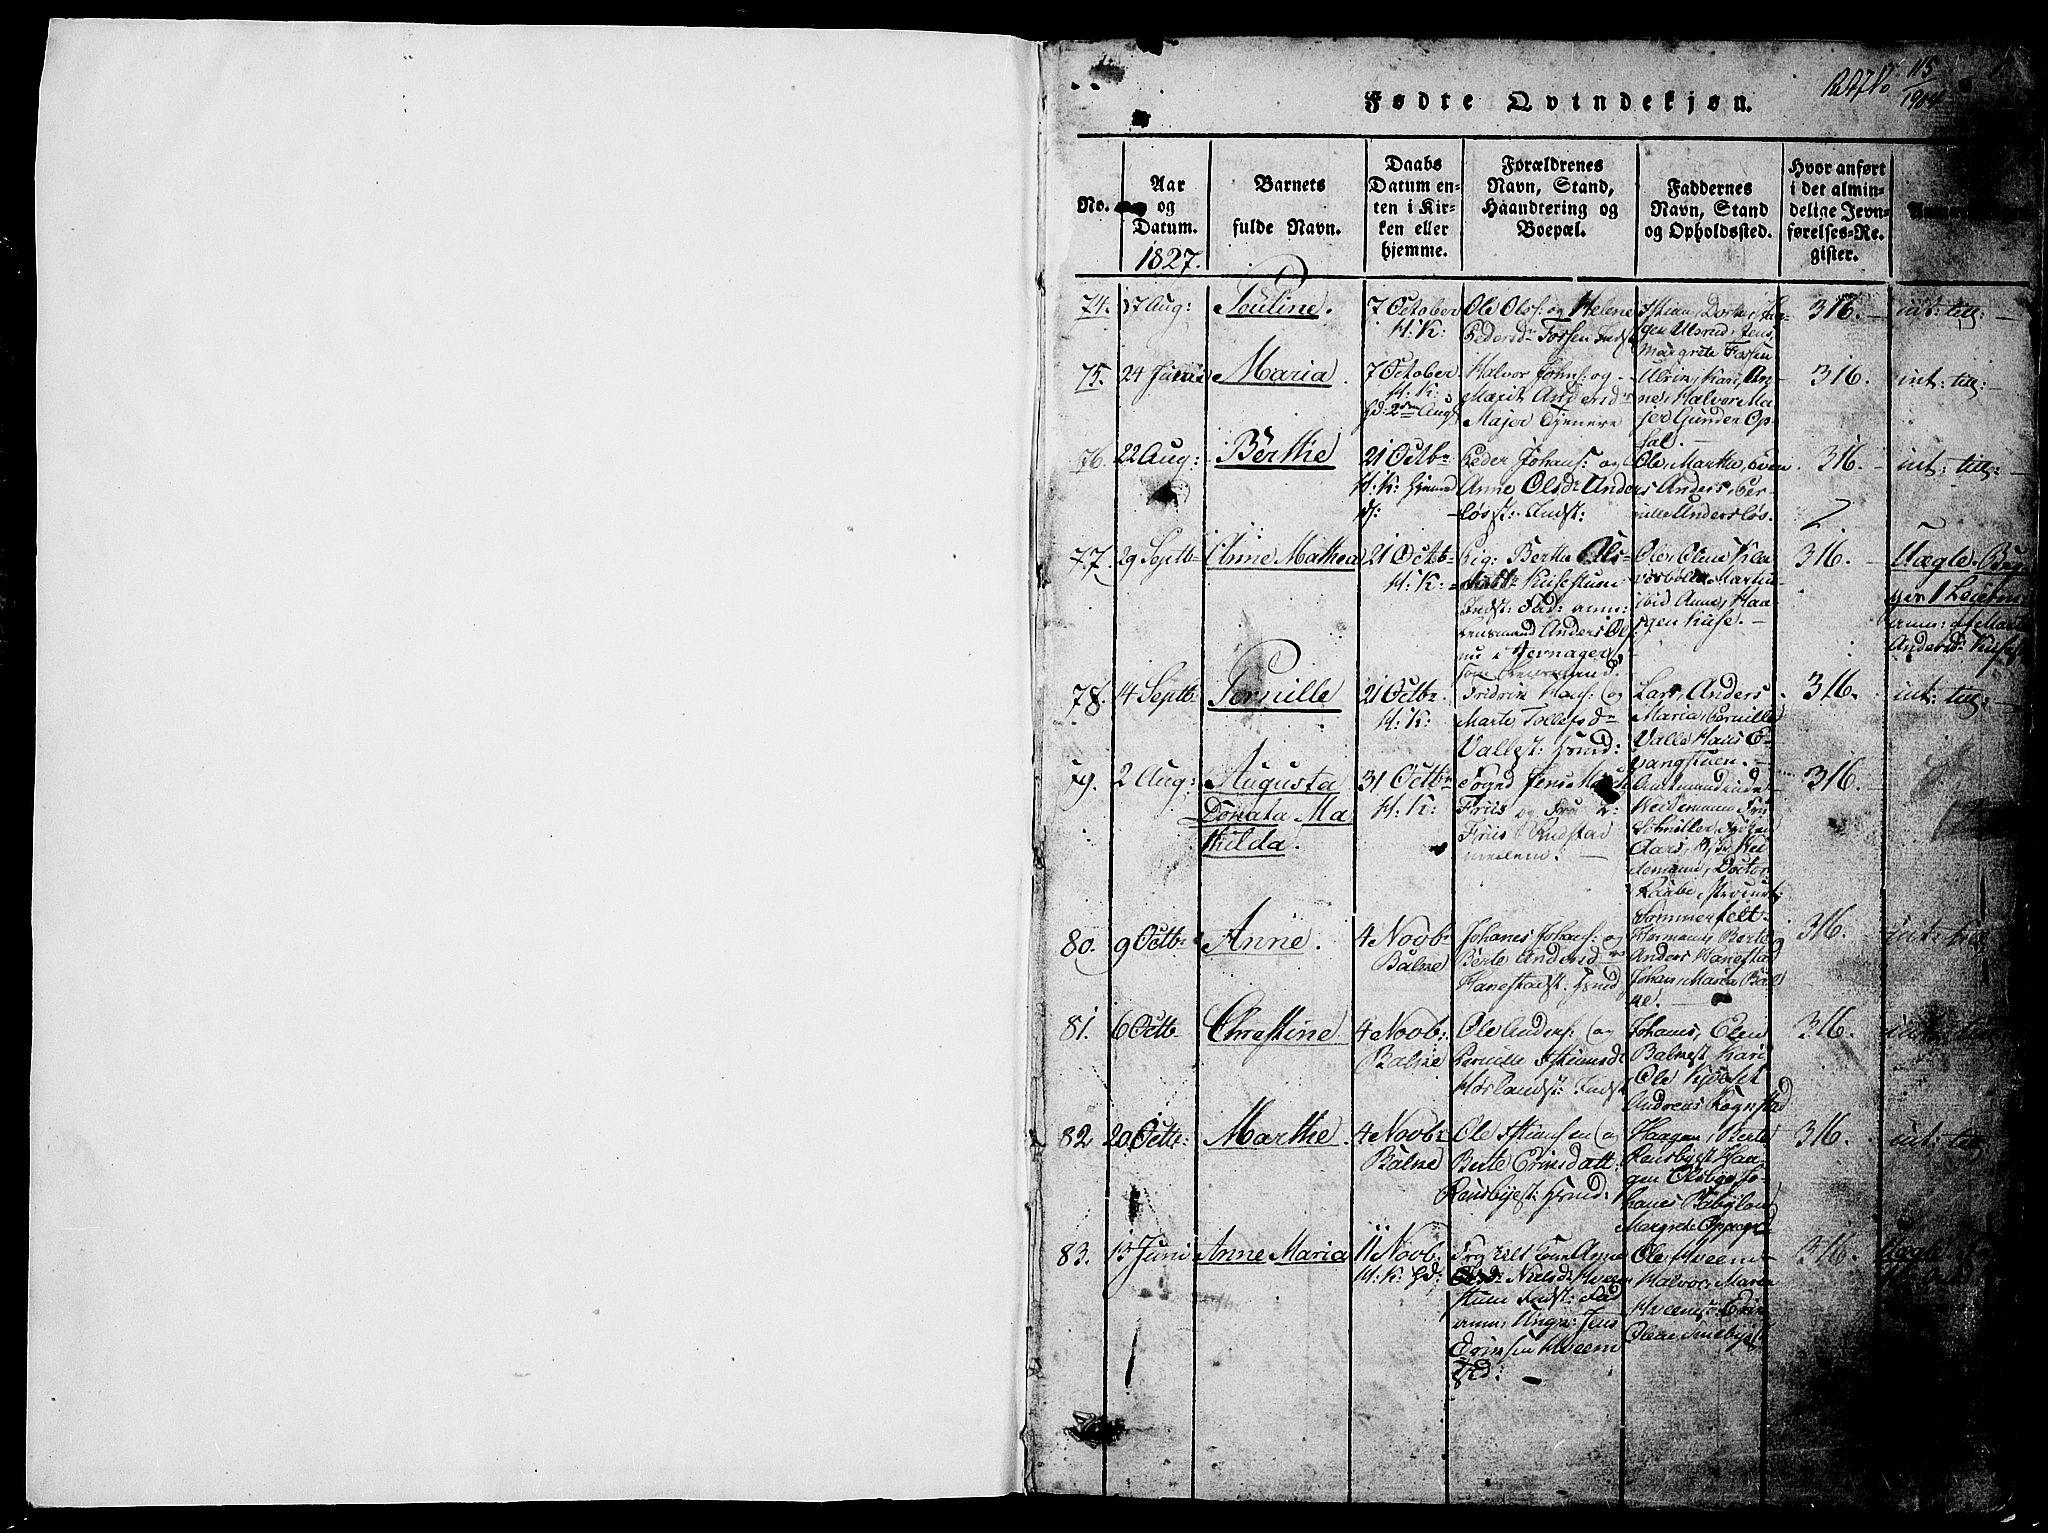 SAH, Østre Toten prestekontor, Klokkerbok nr. 1, 1827-1839, s. 1